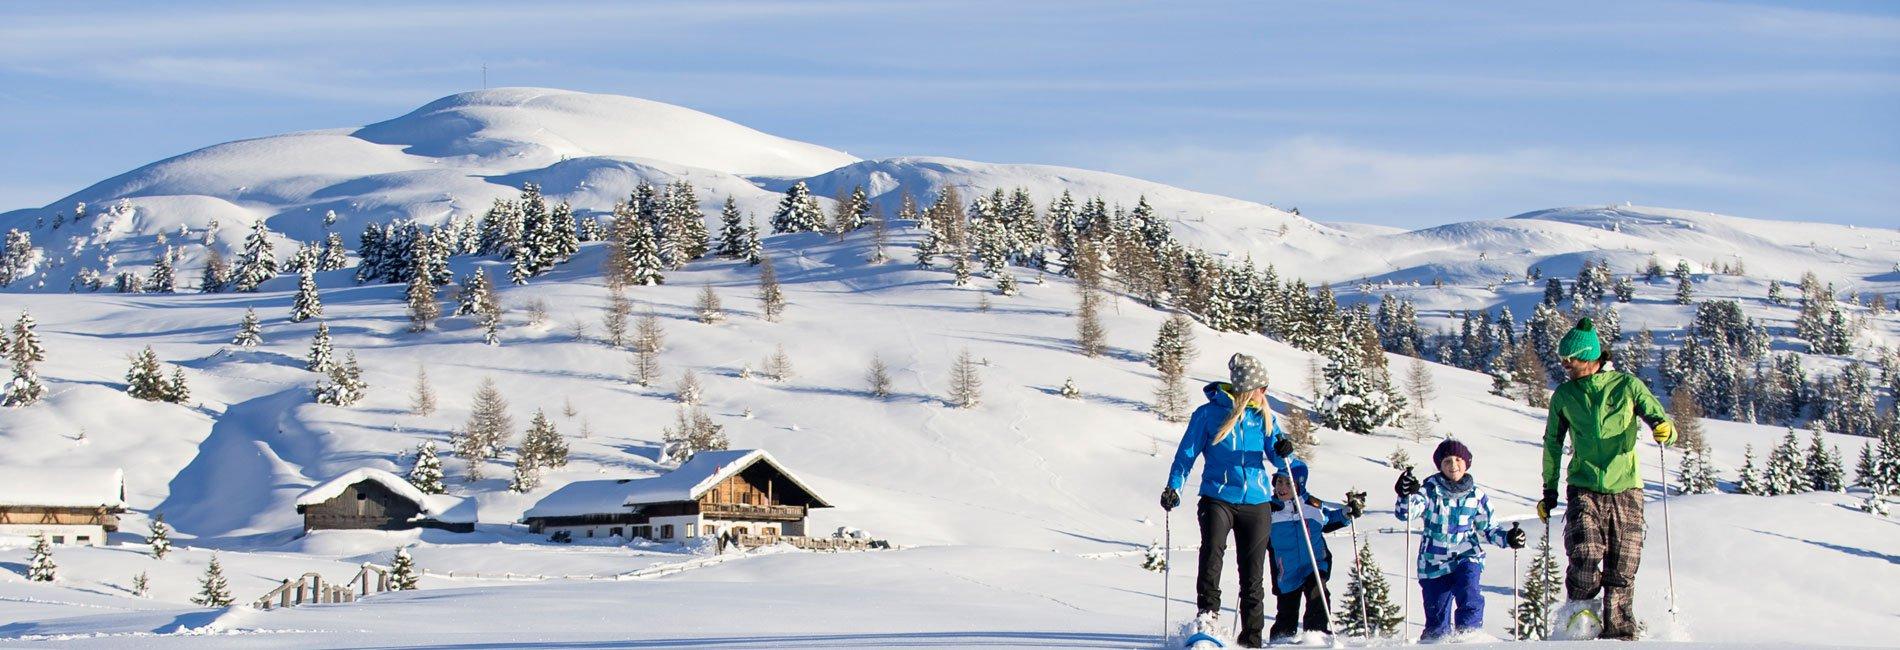 skiurlaub-meransen-30